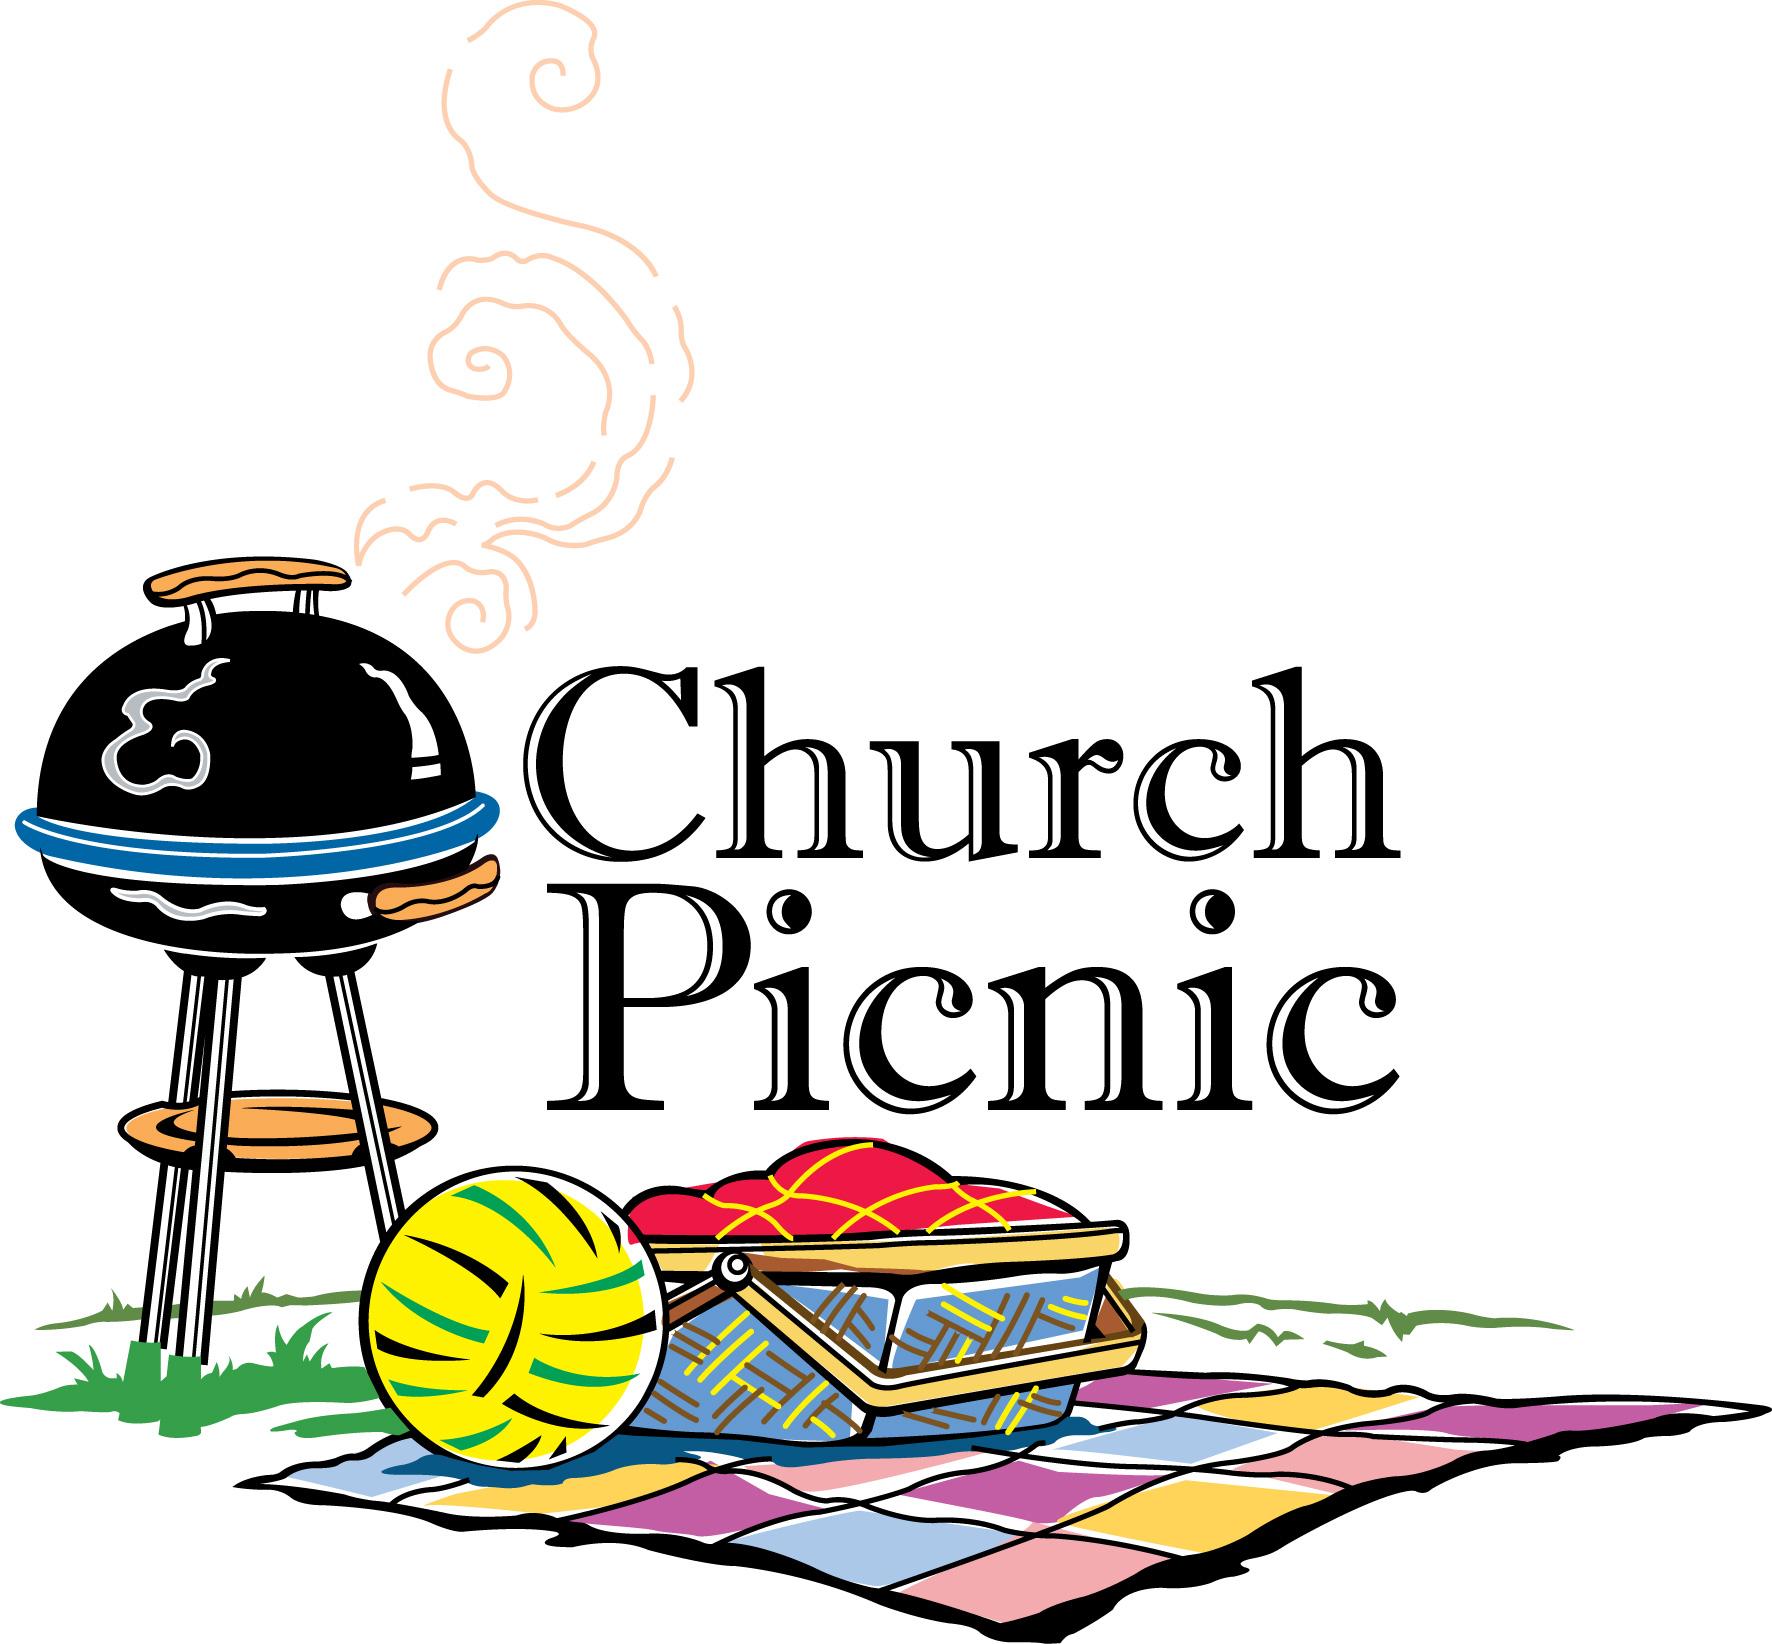 1772x1644 Free Church Picnic Clip Art Clipart Panda